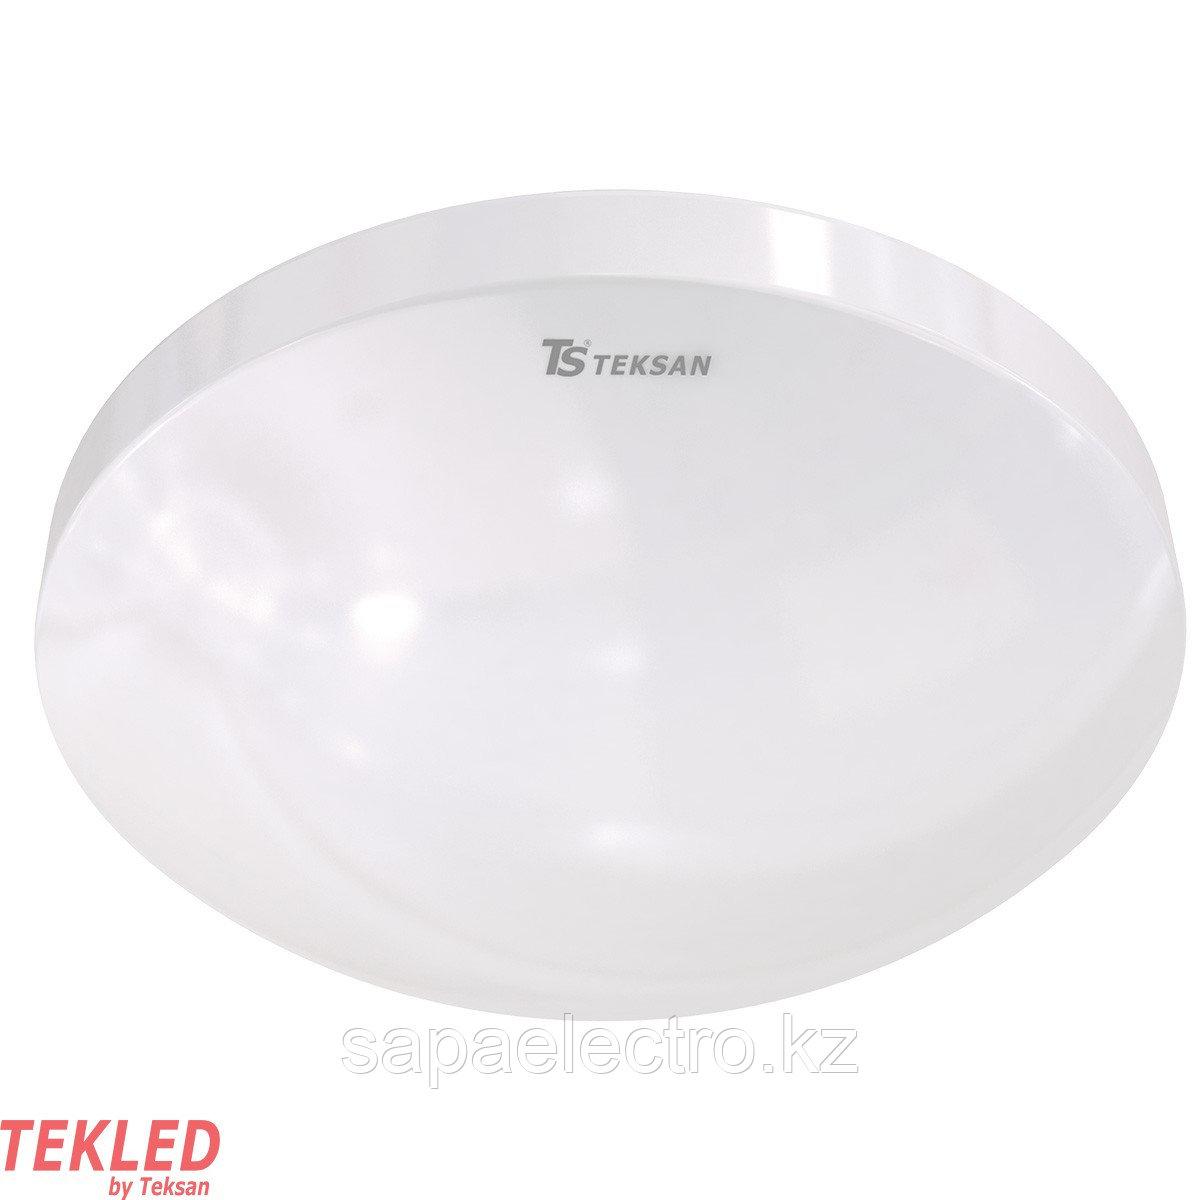 Свет-к LED OMEGA STANDART 30W 4000K 380мм MGL1/10шт